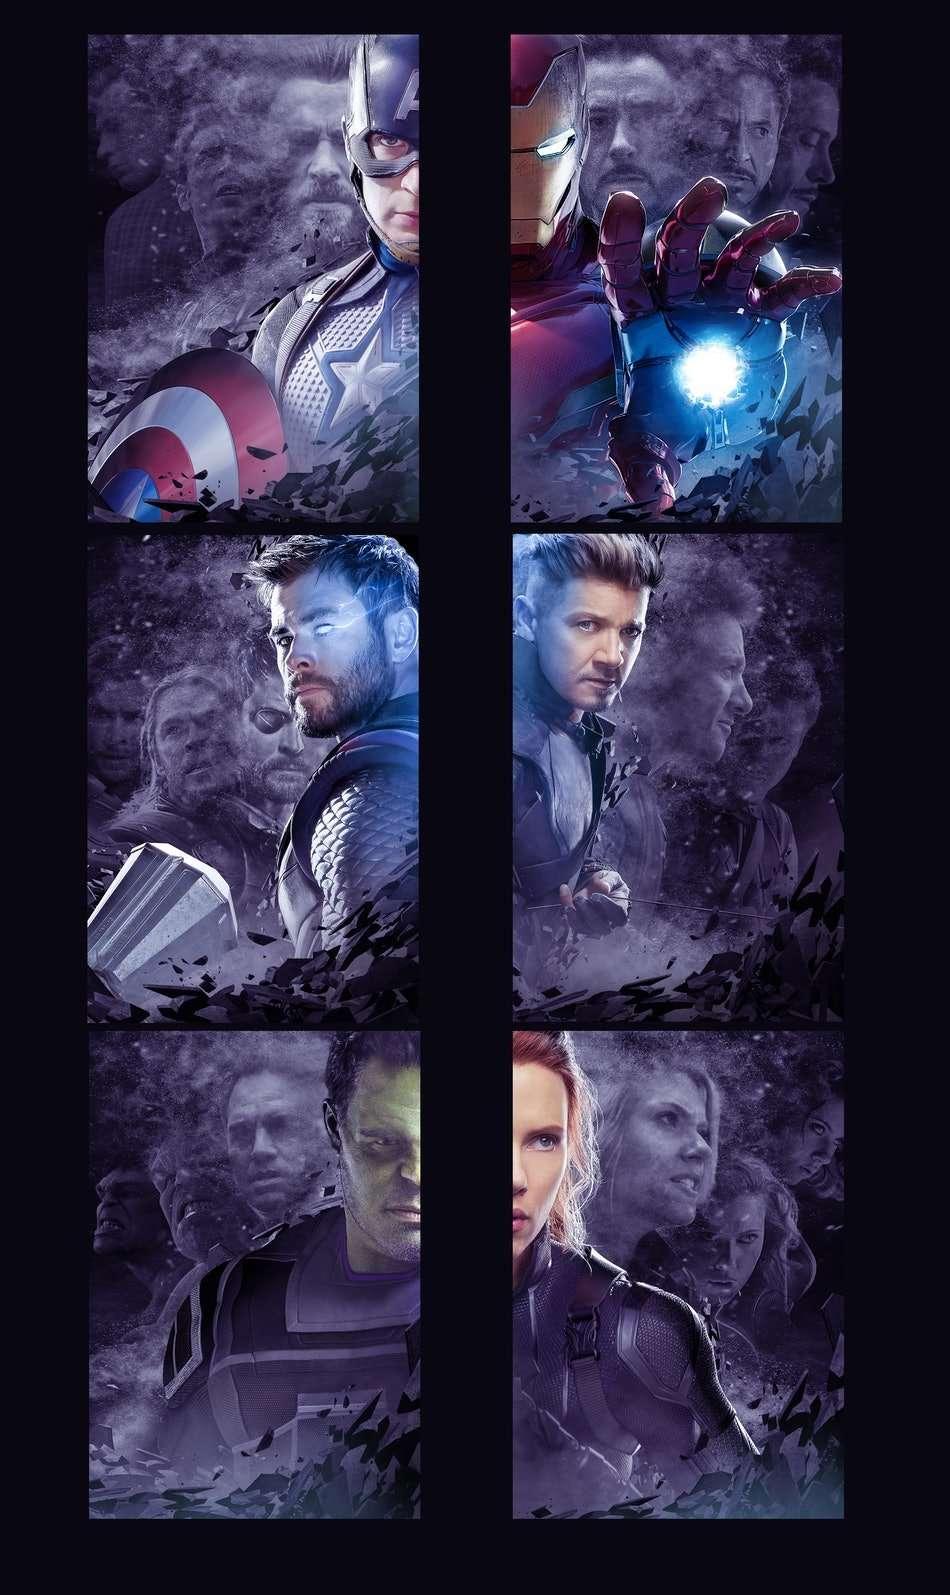 aengers-endgame-unused-poster.jpg